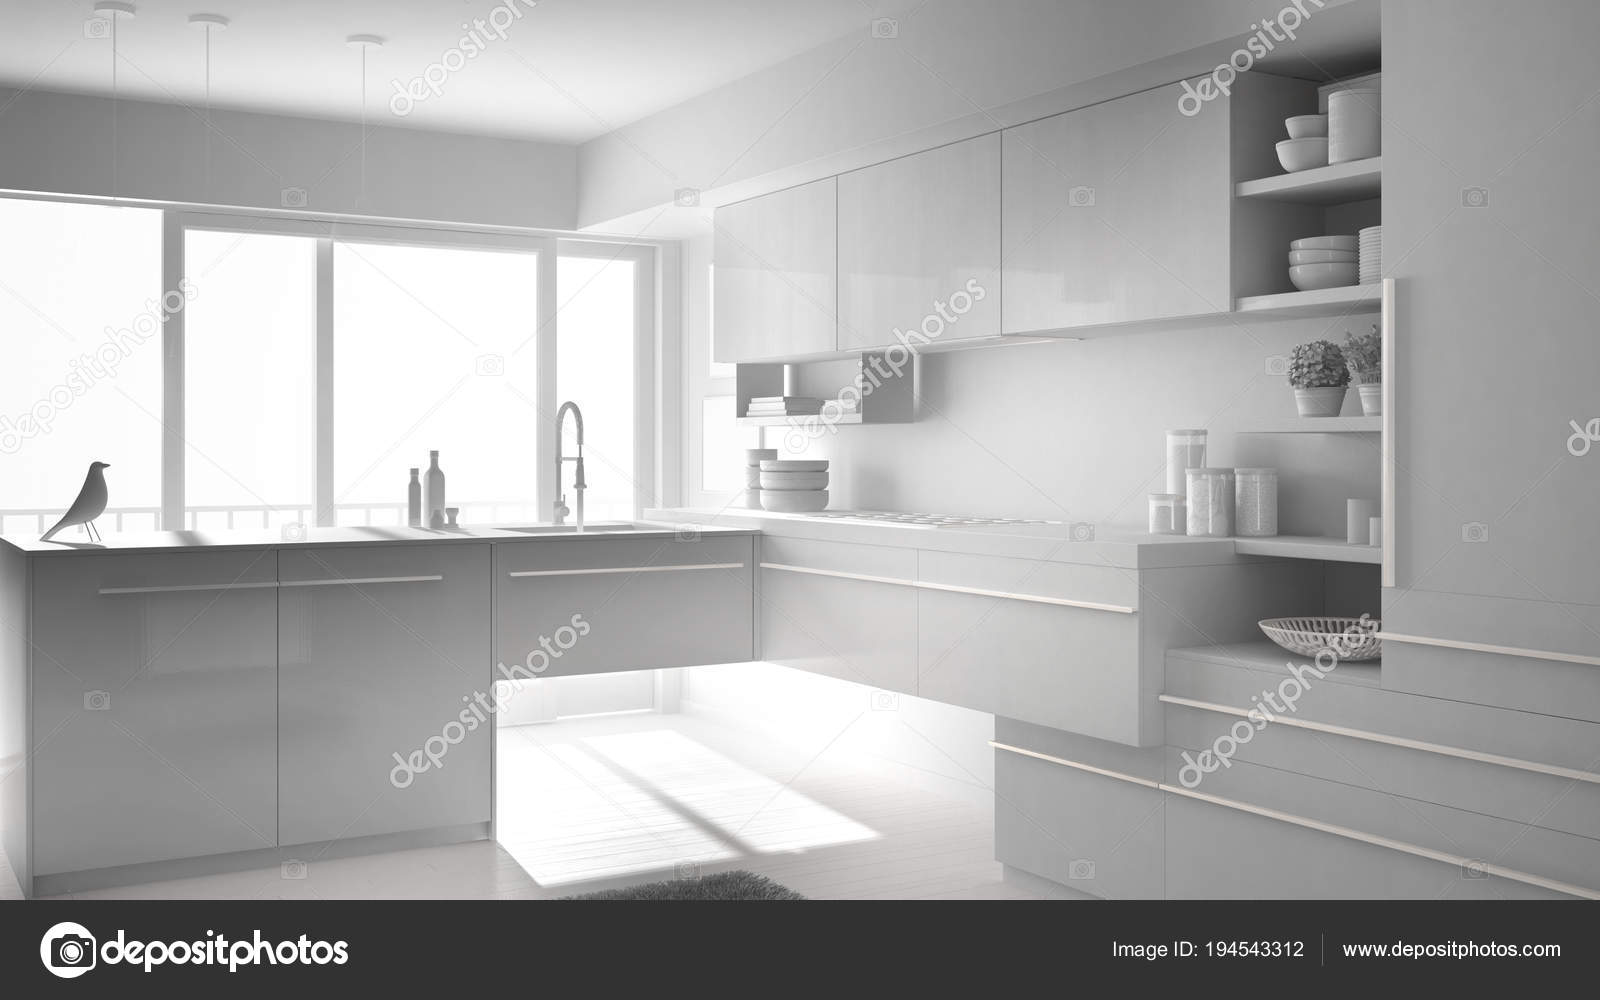 Witte Minimalistische Woonkeuken : Totale witte project van moderne minimalistische keuken met eiland